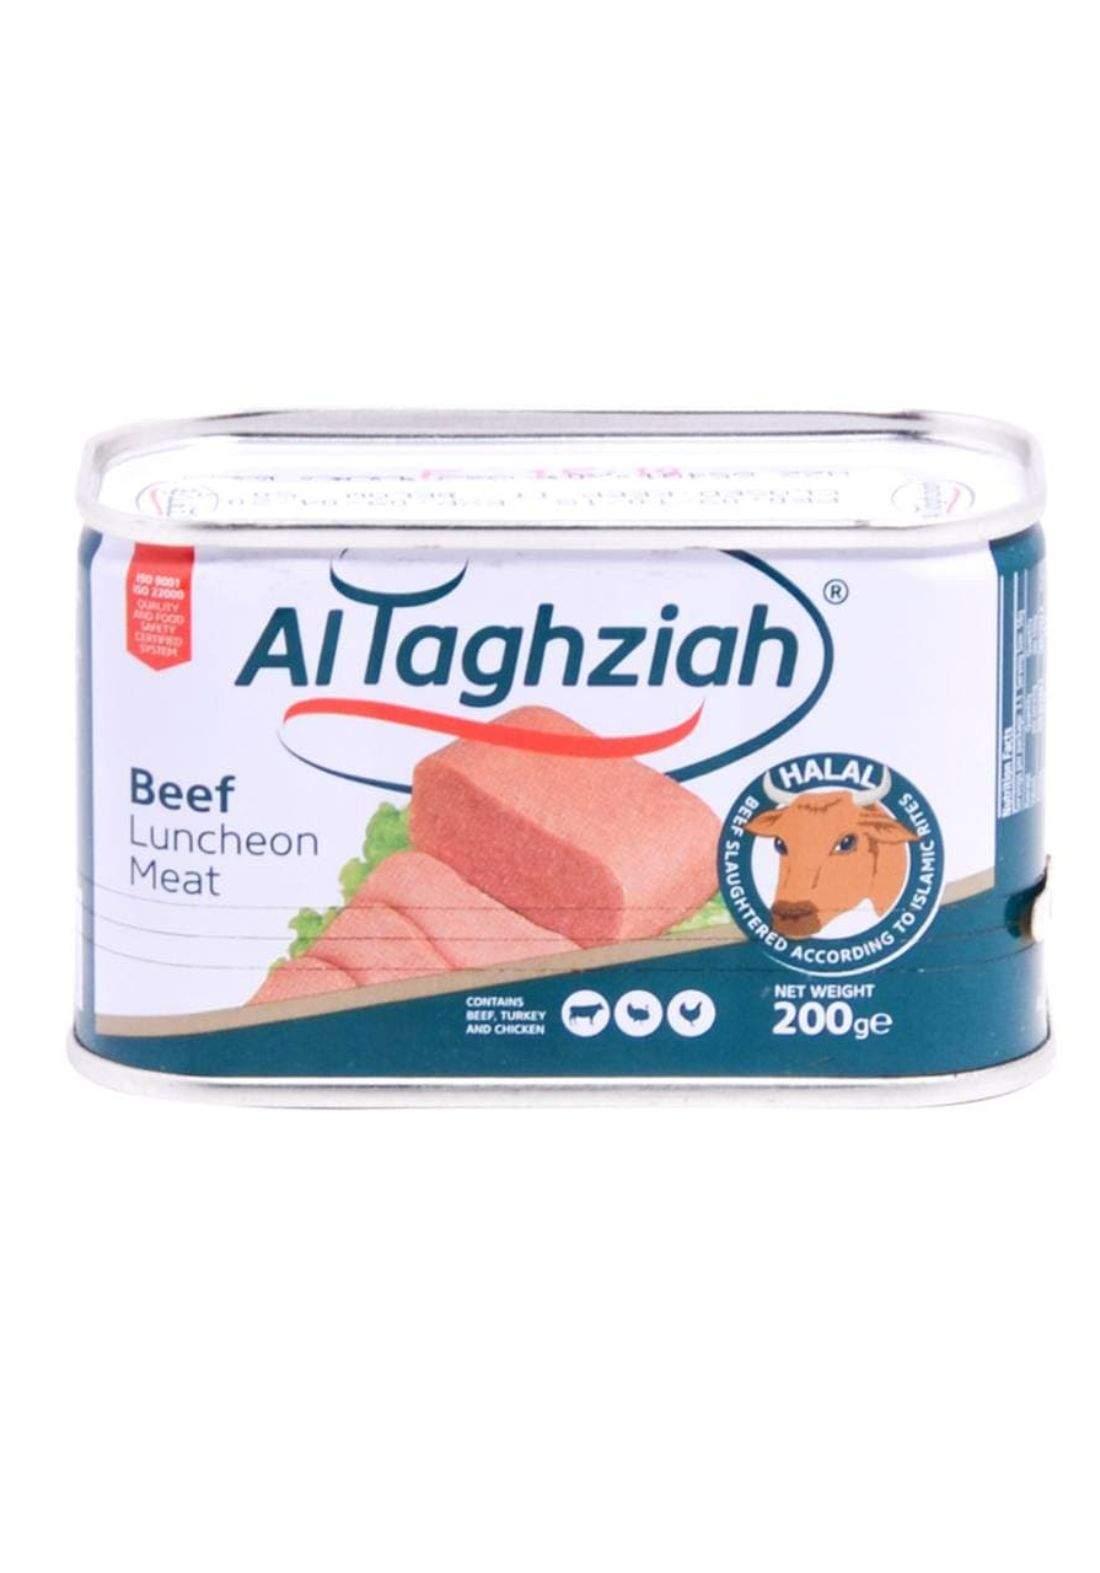 Altaghziah beef luncheon meat  200g التغذية لحم لانشون بقري